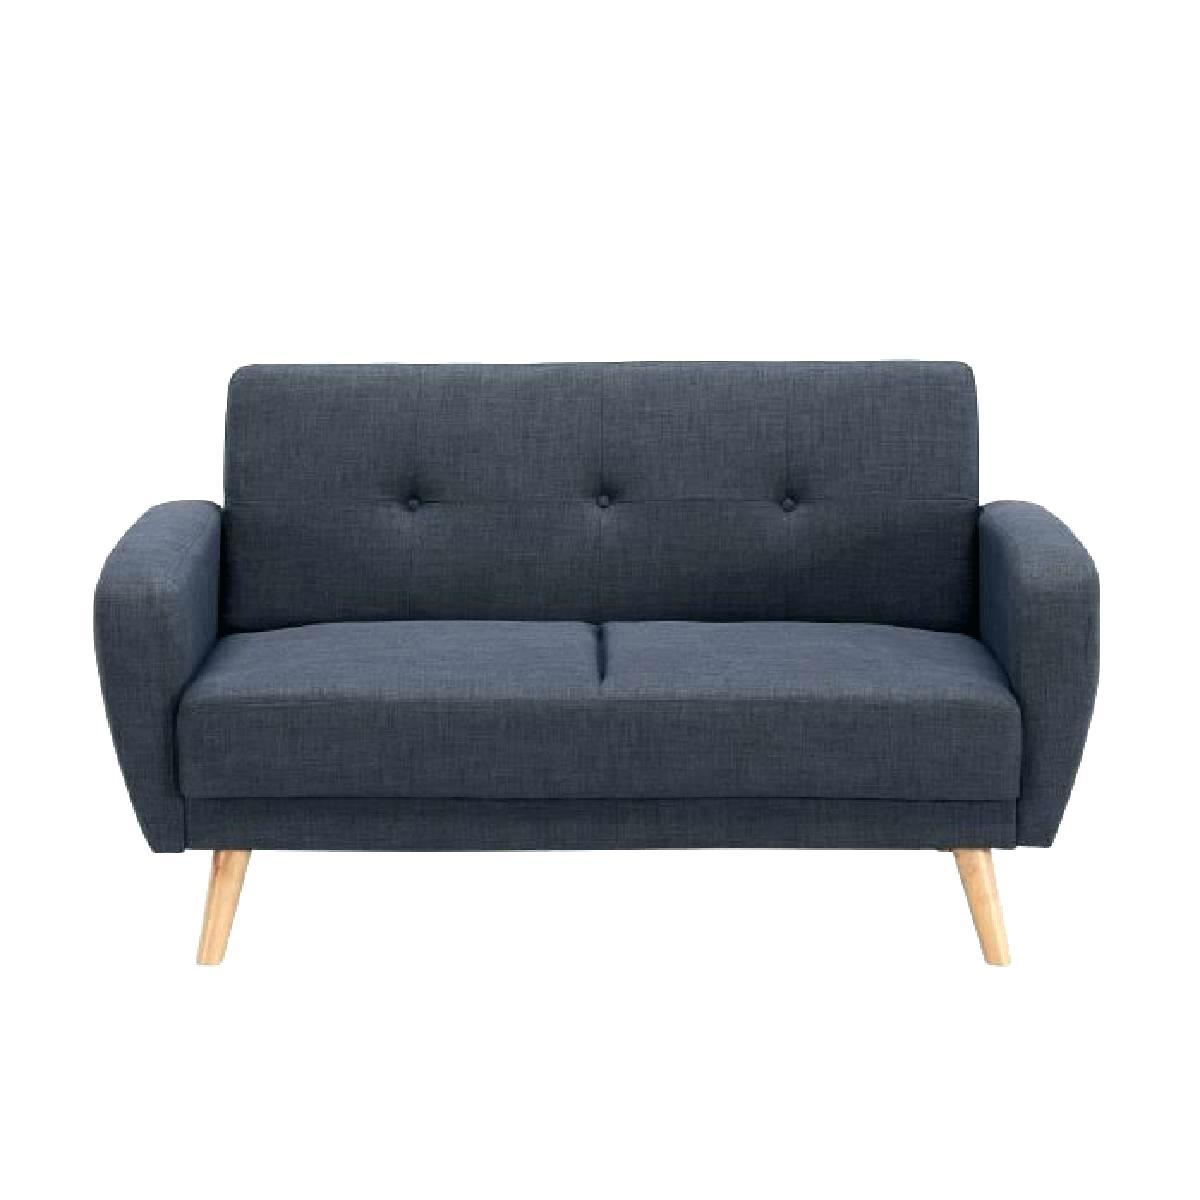 Ikea Canapé Modulable Inspirant Galerie Lit Noir Ikea 33 Canape 2 Places New Stocksund Nolhaga Gris Beige